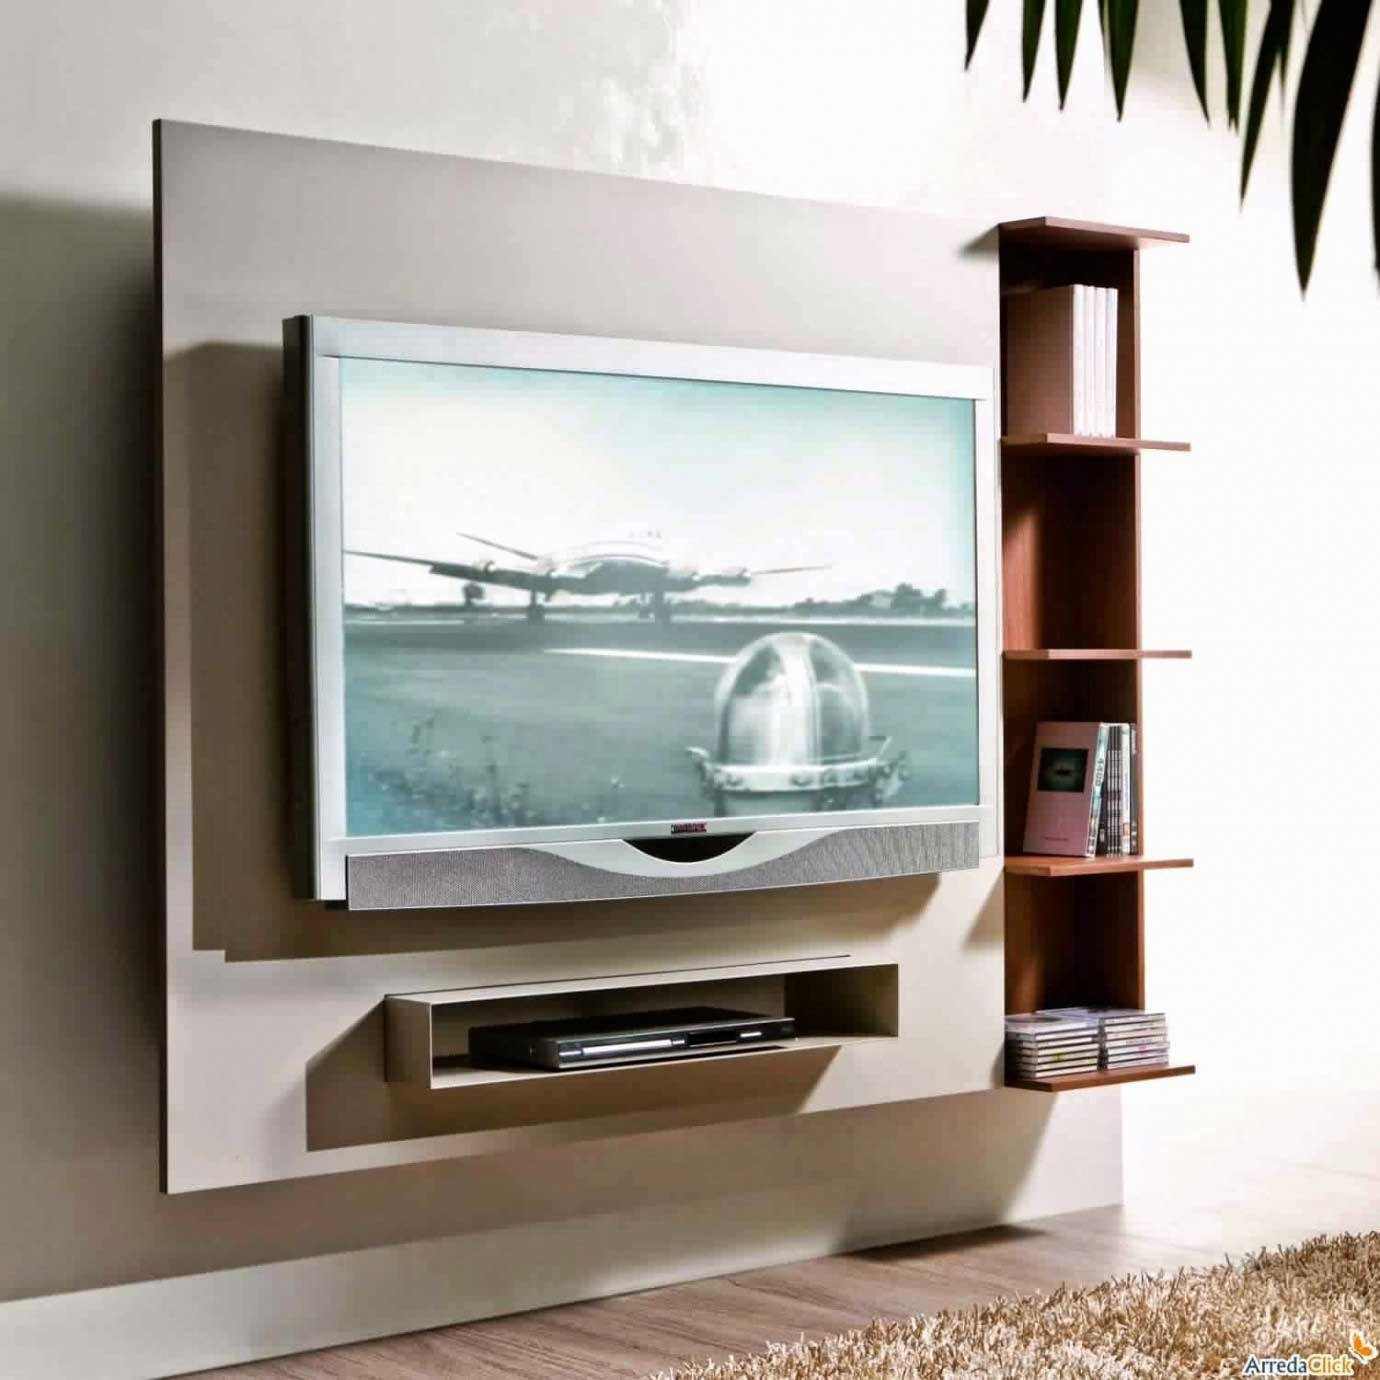 Ensemble Meuble Tv Et Table Basse Ensemble Meuble Tv Bois Meuble Tv Table Basse Luxe Banc Tv Bois Of Meuble Tv Mural Meuble Tv Suspendu Parement Mural